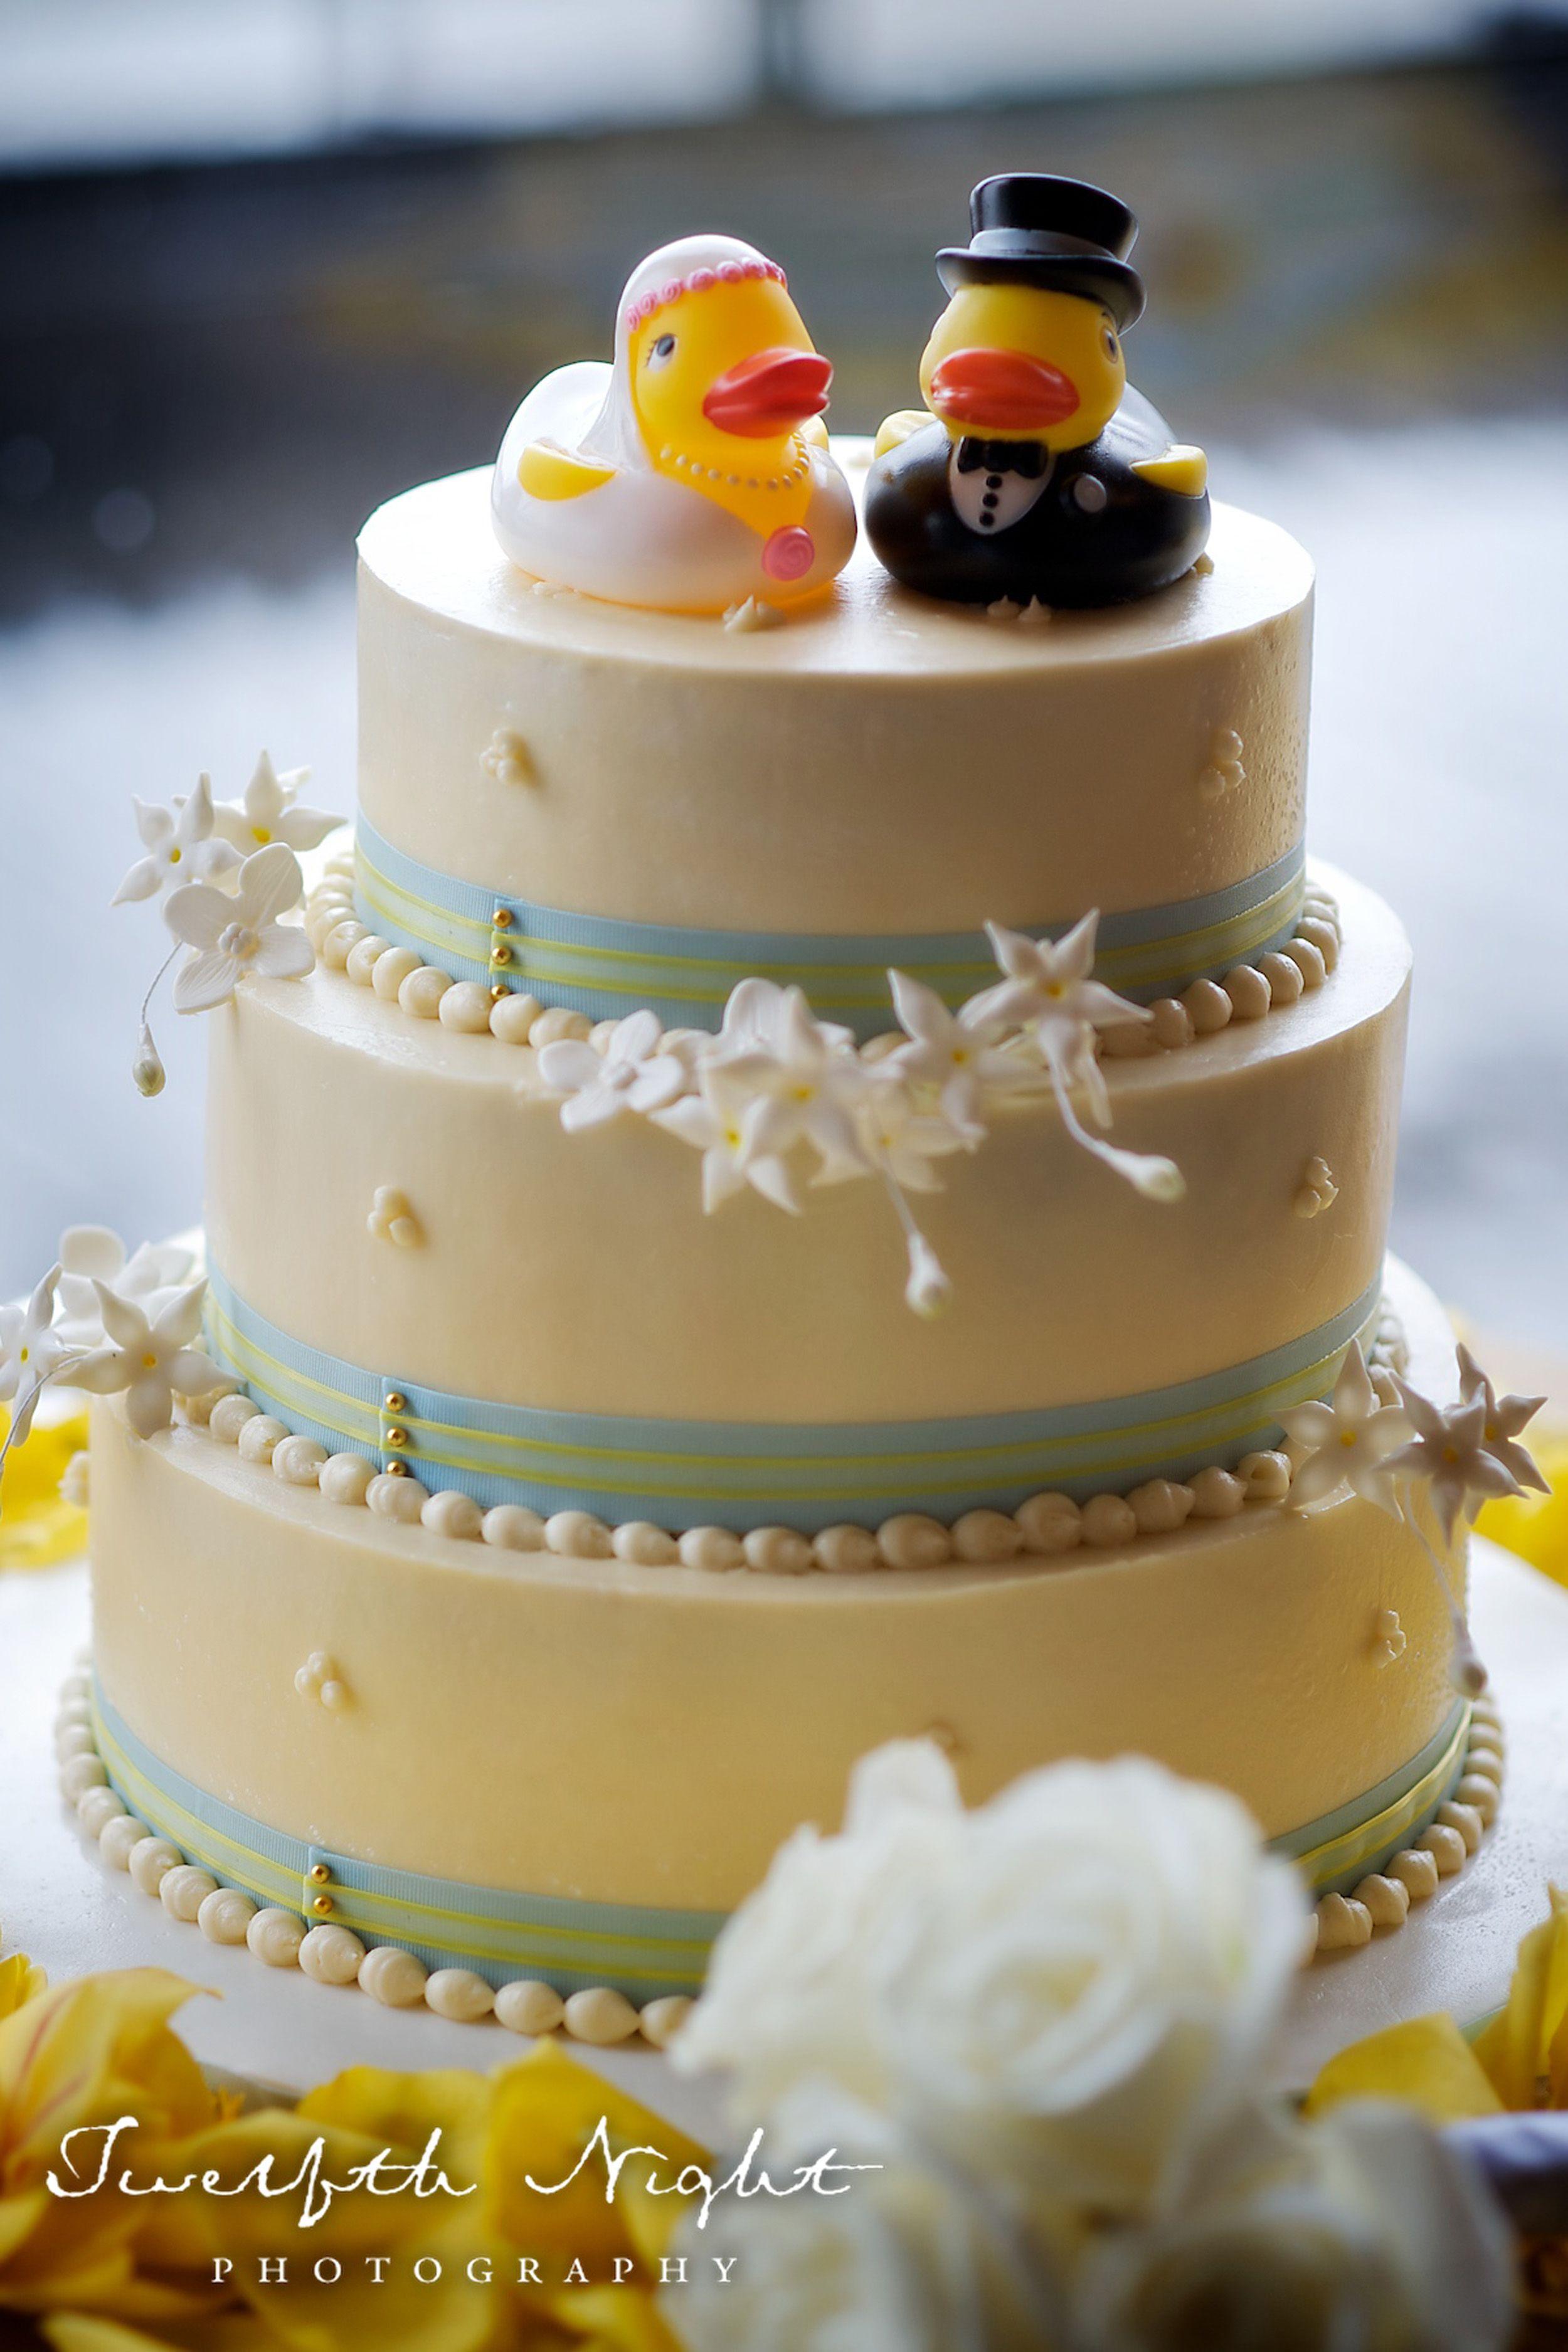 Vegan wedding cake | Wedding & celebration cakes | Pinterest | Vegan ...